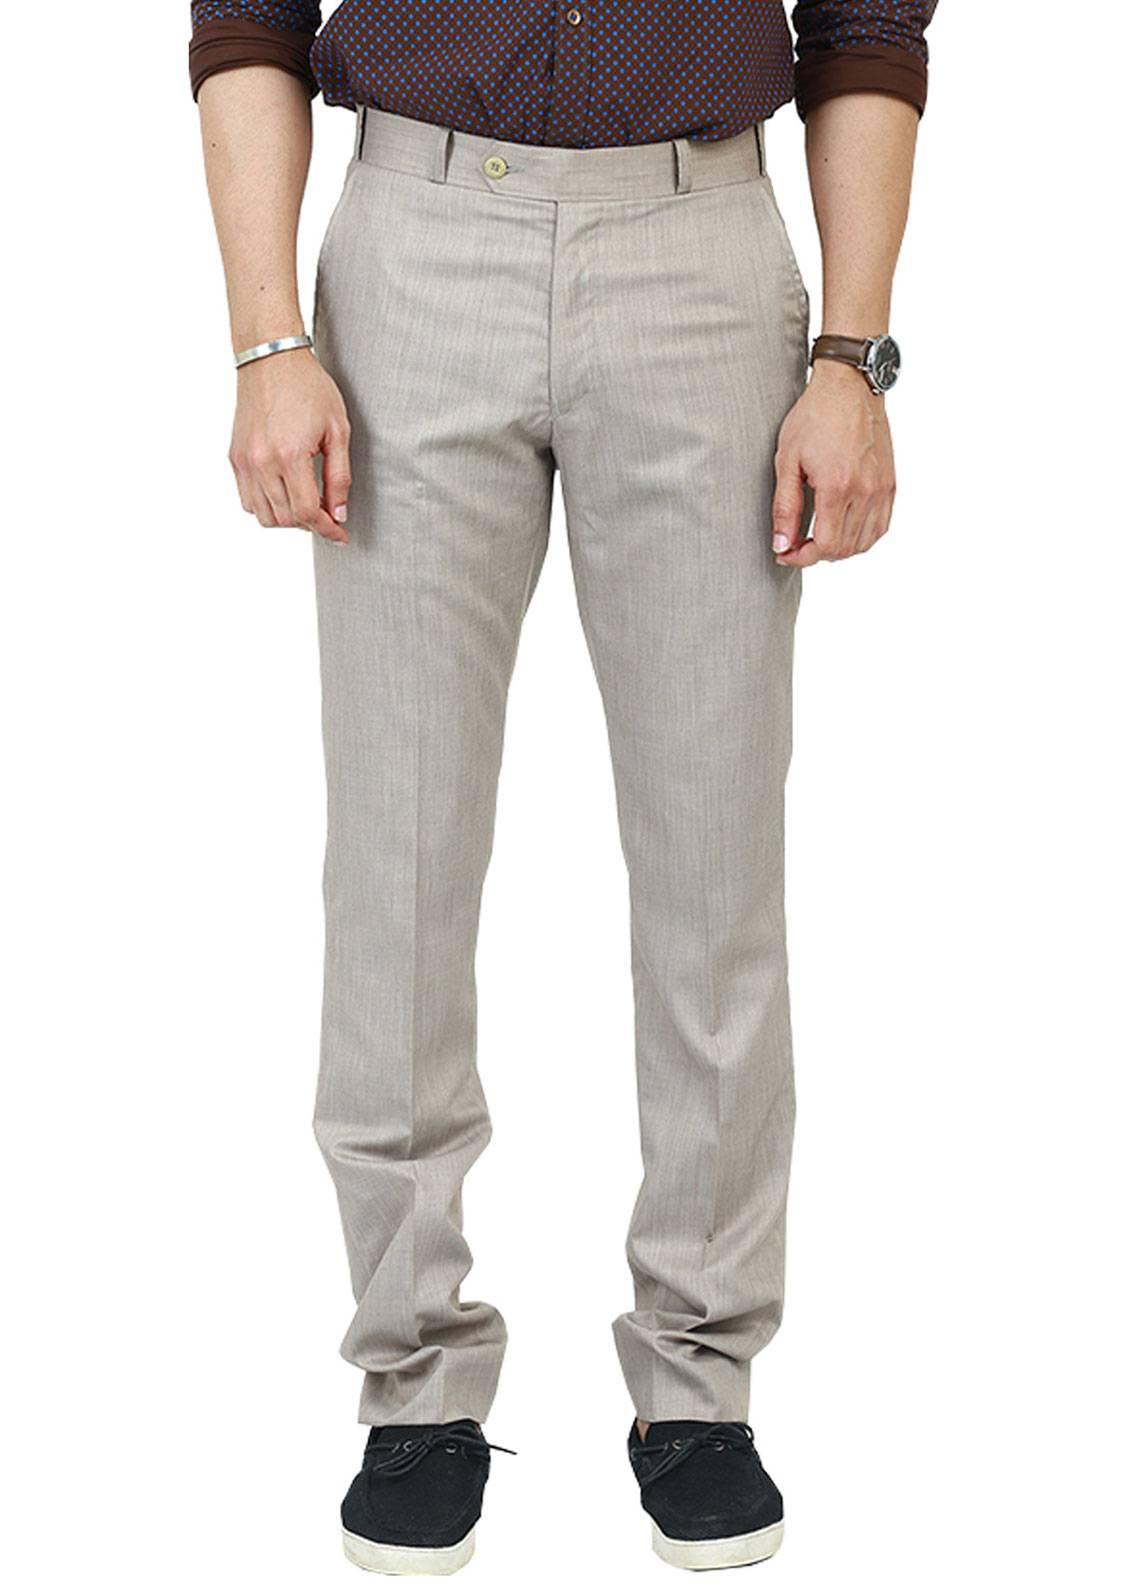 Shahzeb Saeed Wash N Wear Dress Trousers for Men - Brown WTR-106